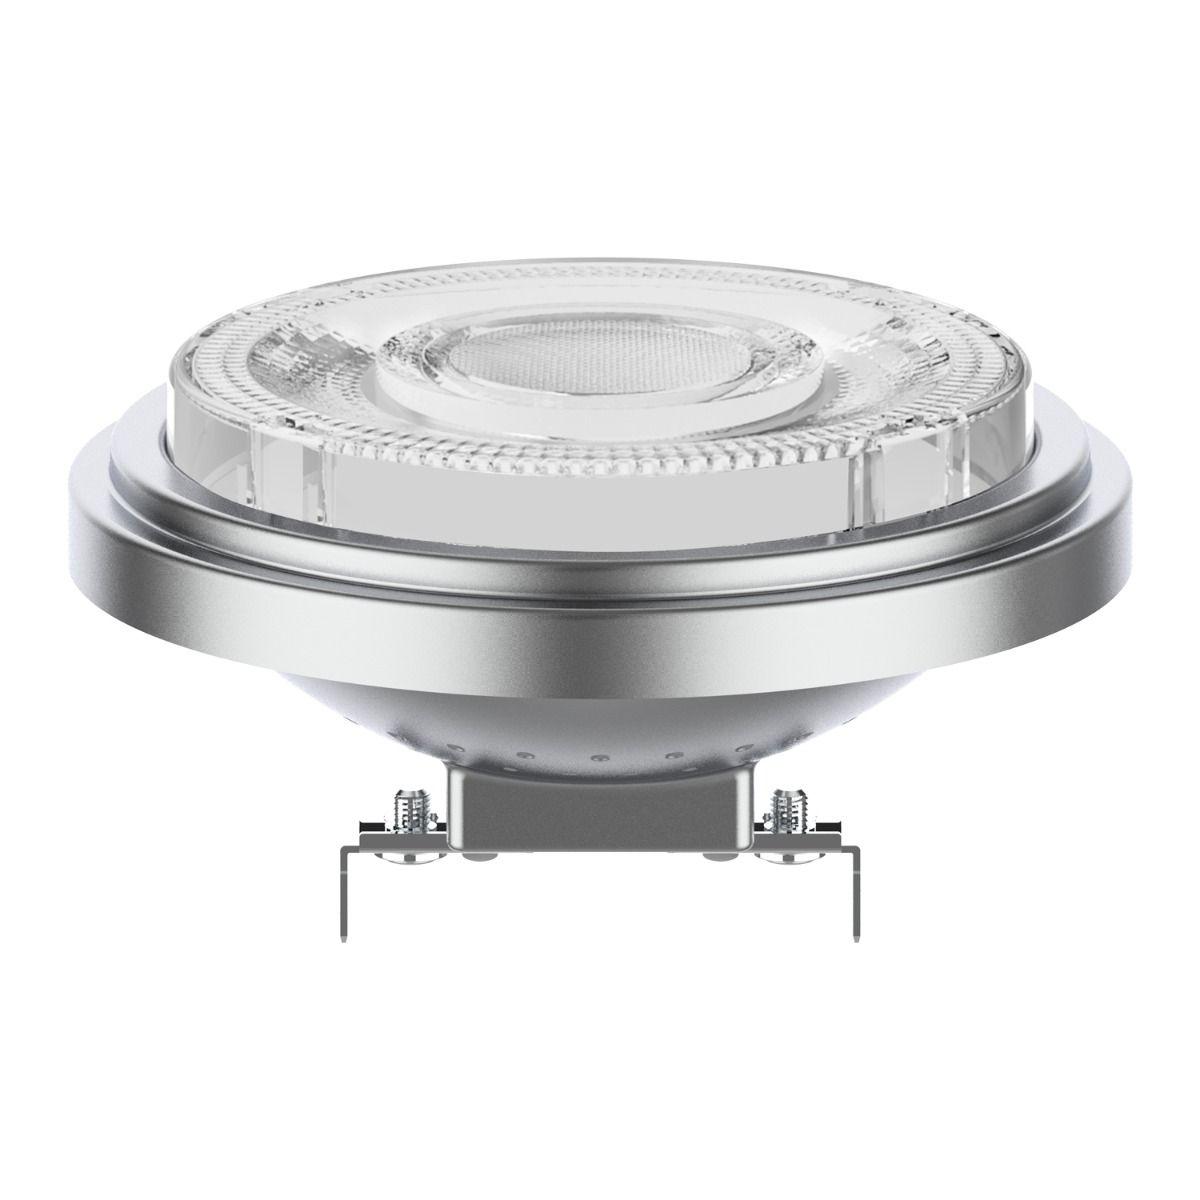 Noxion Lucent LED Spot AR111 G53 12V 11.5W 927 24D | Dimbaar - Hoogste Kleurweergave - Vervanger voor 75W